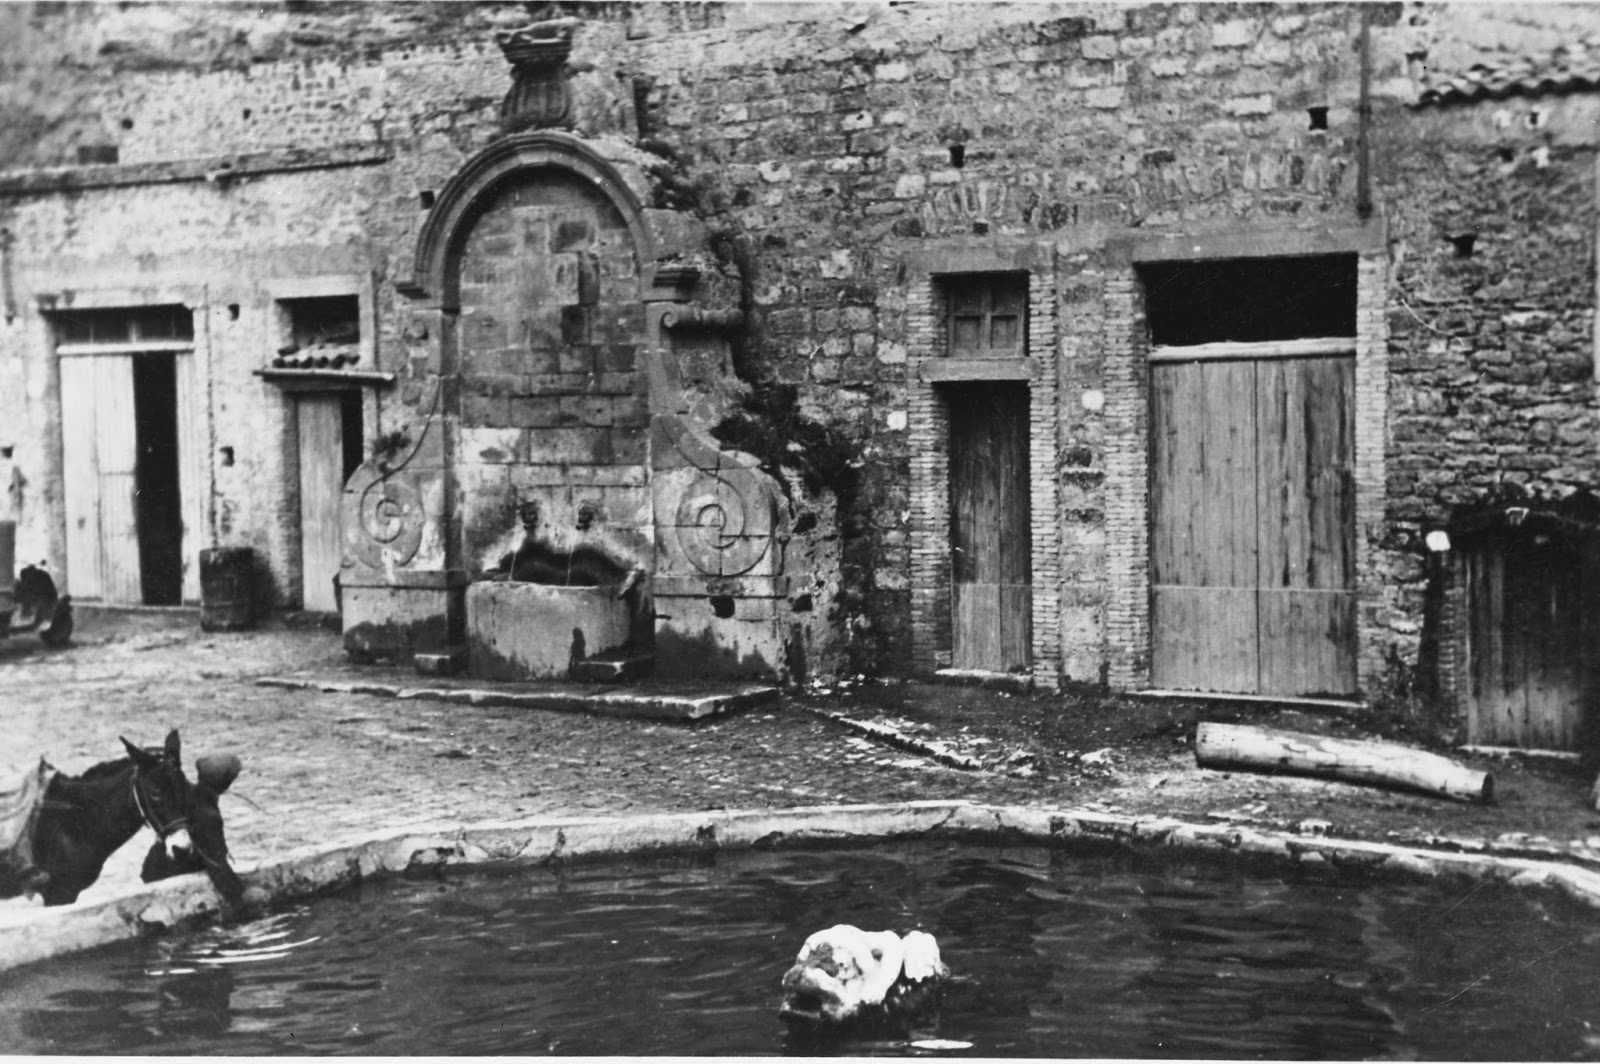 CRONOLOGIA DI PIAZZA ARMERINA: Fontana Altacura / n. 12